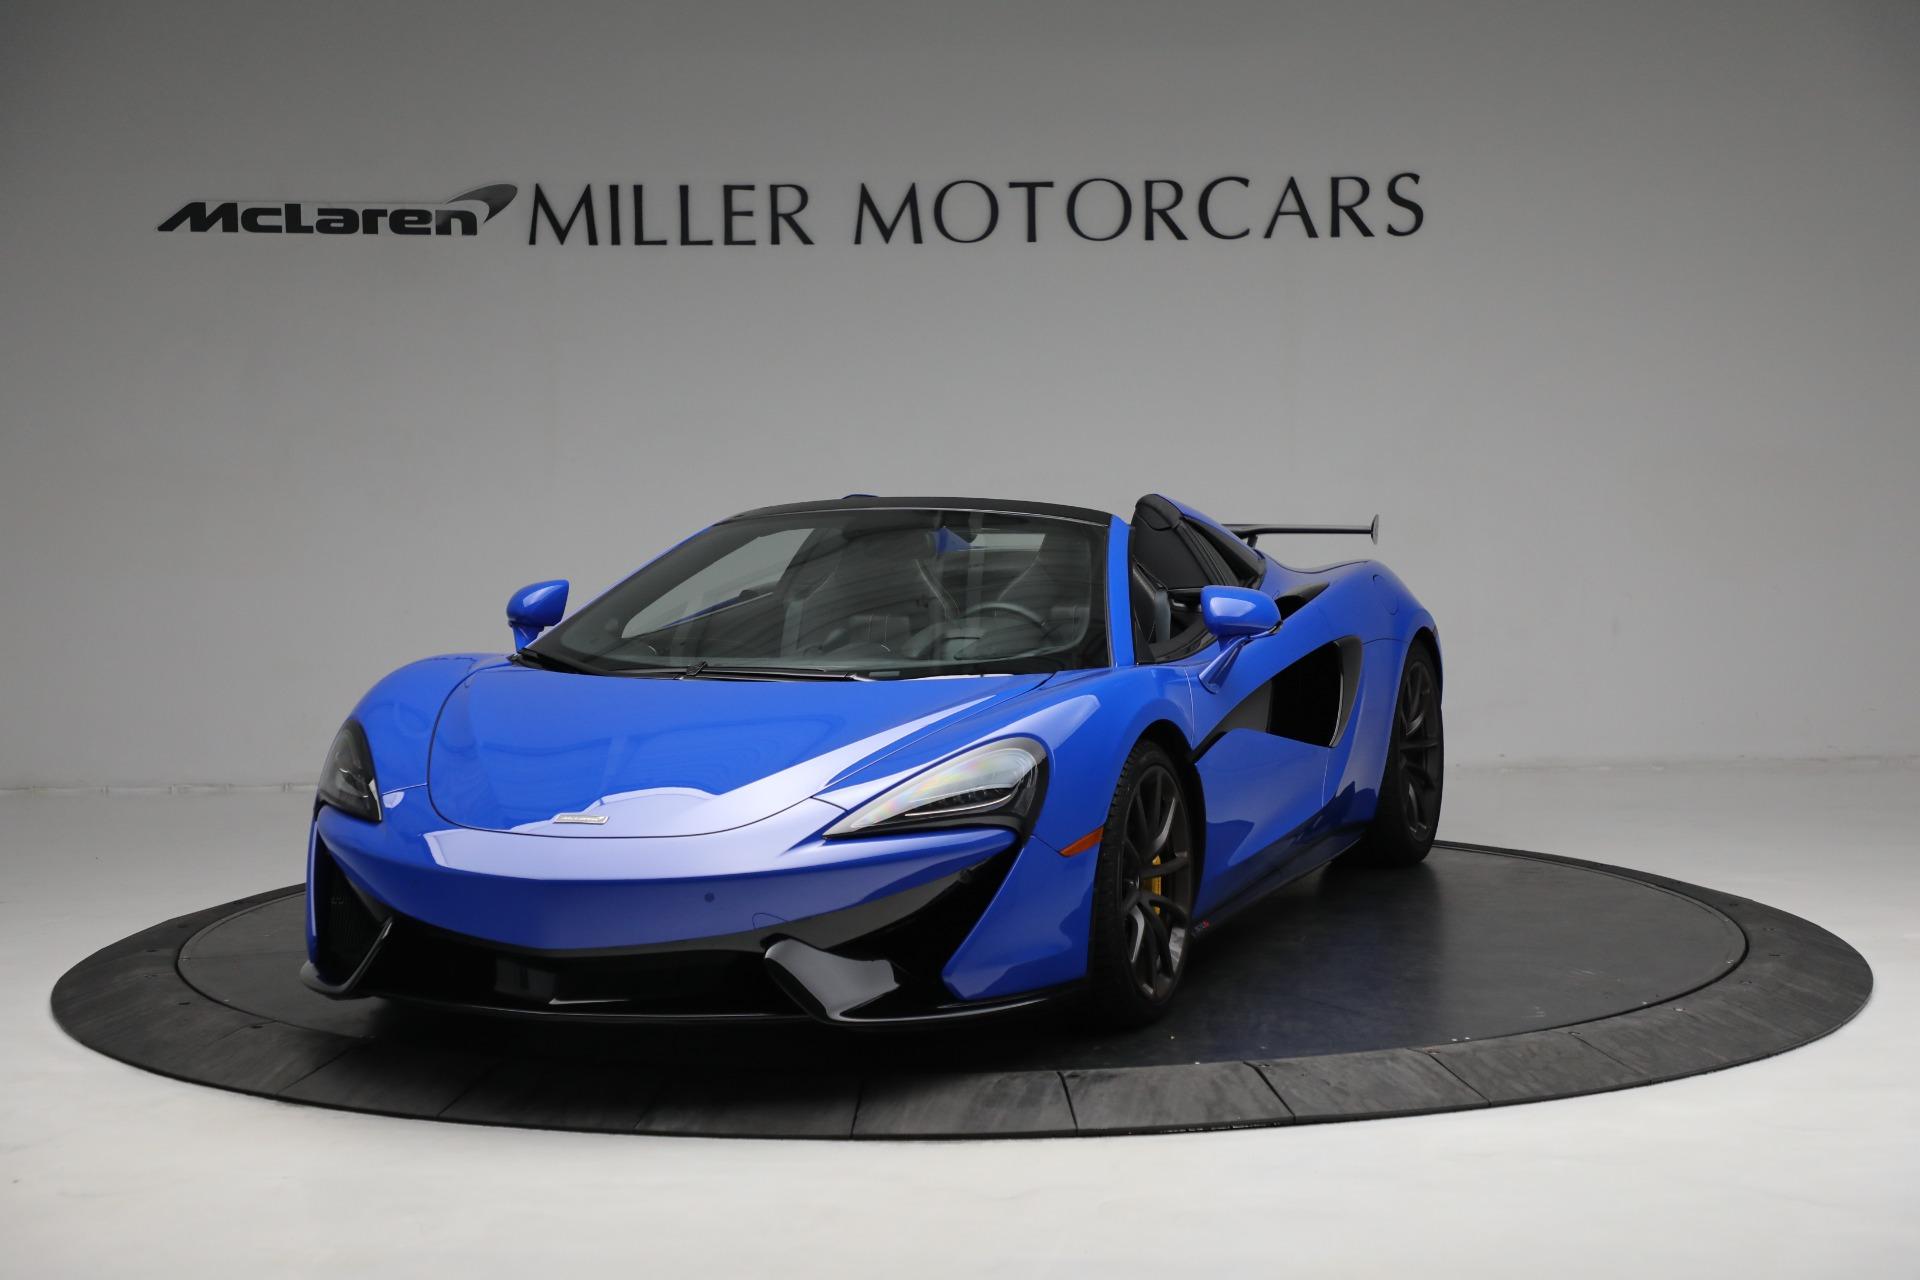 New 2020 McLaren 570S Spider Convertible for sale $236,270 at McLaren Greenwich in Greenwich CT 06830 1